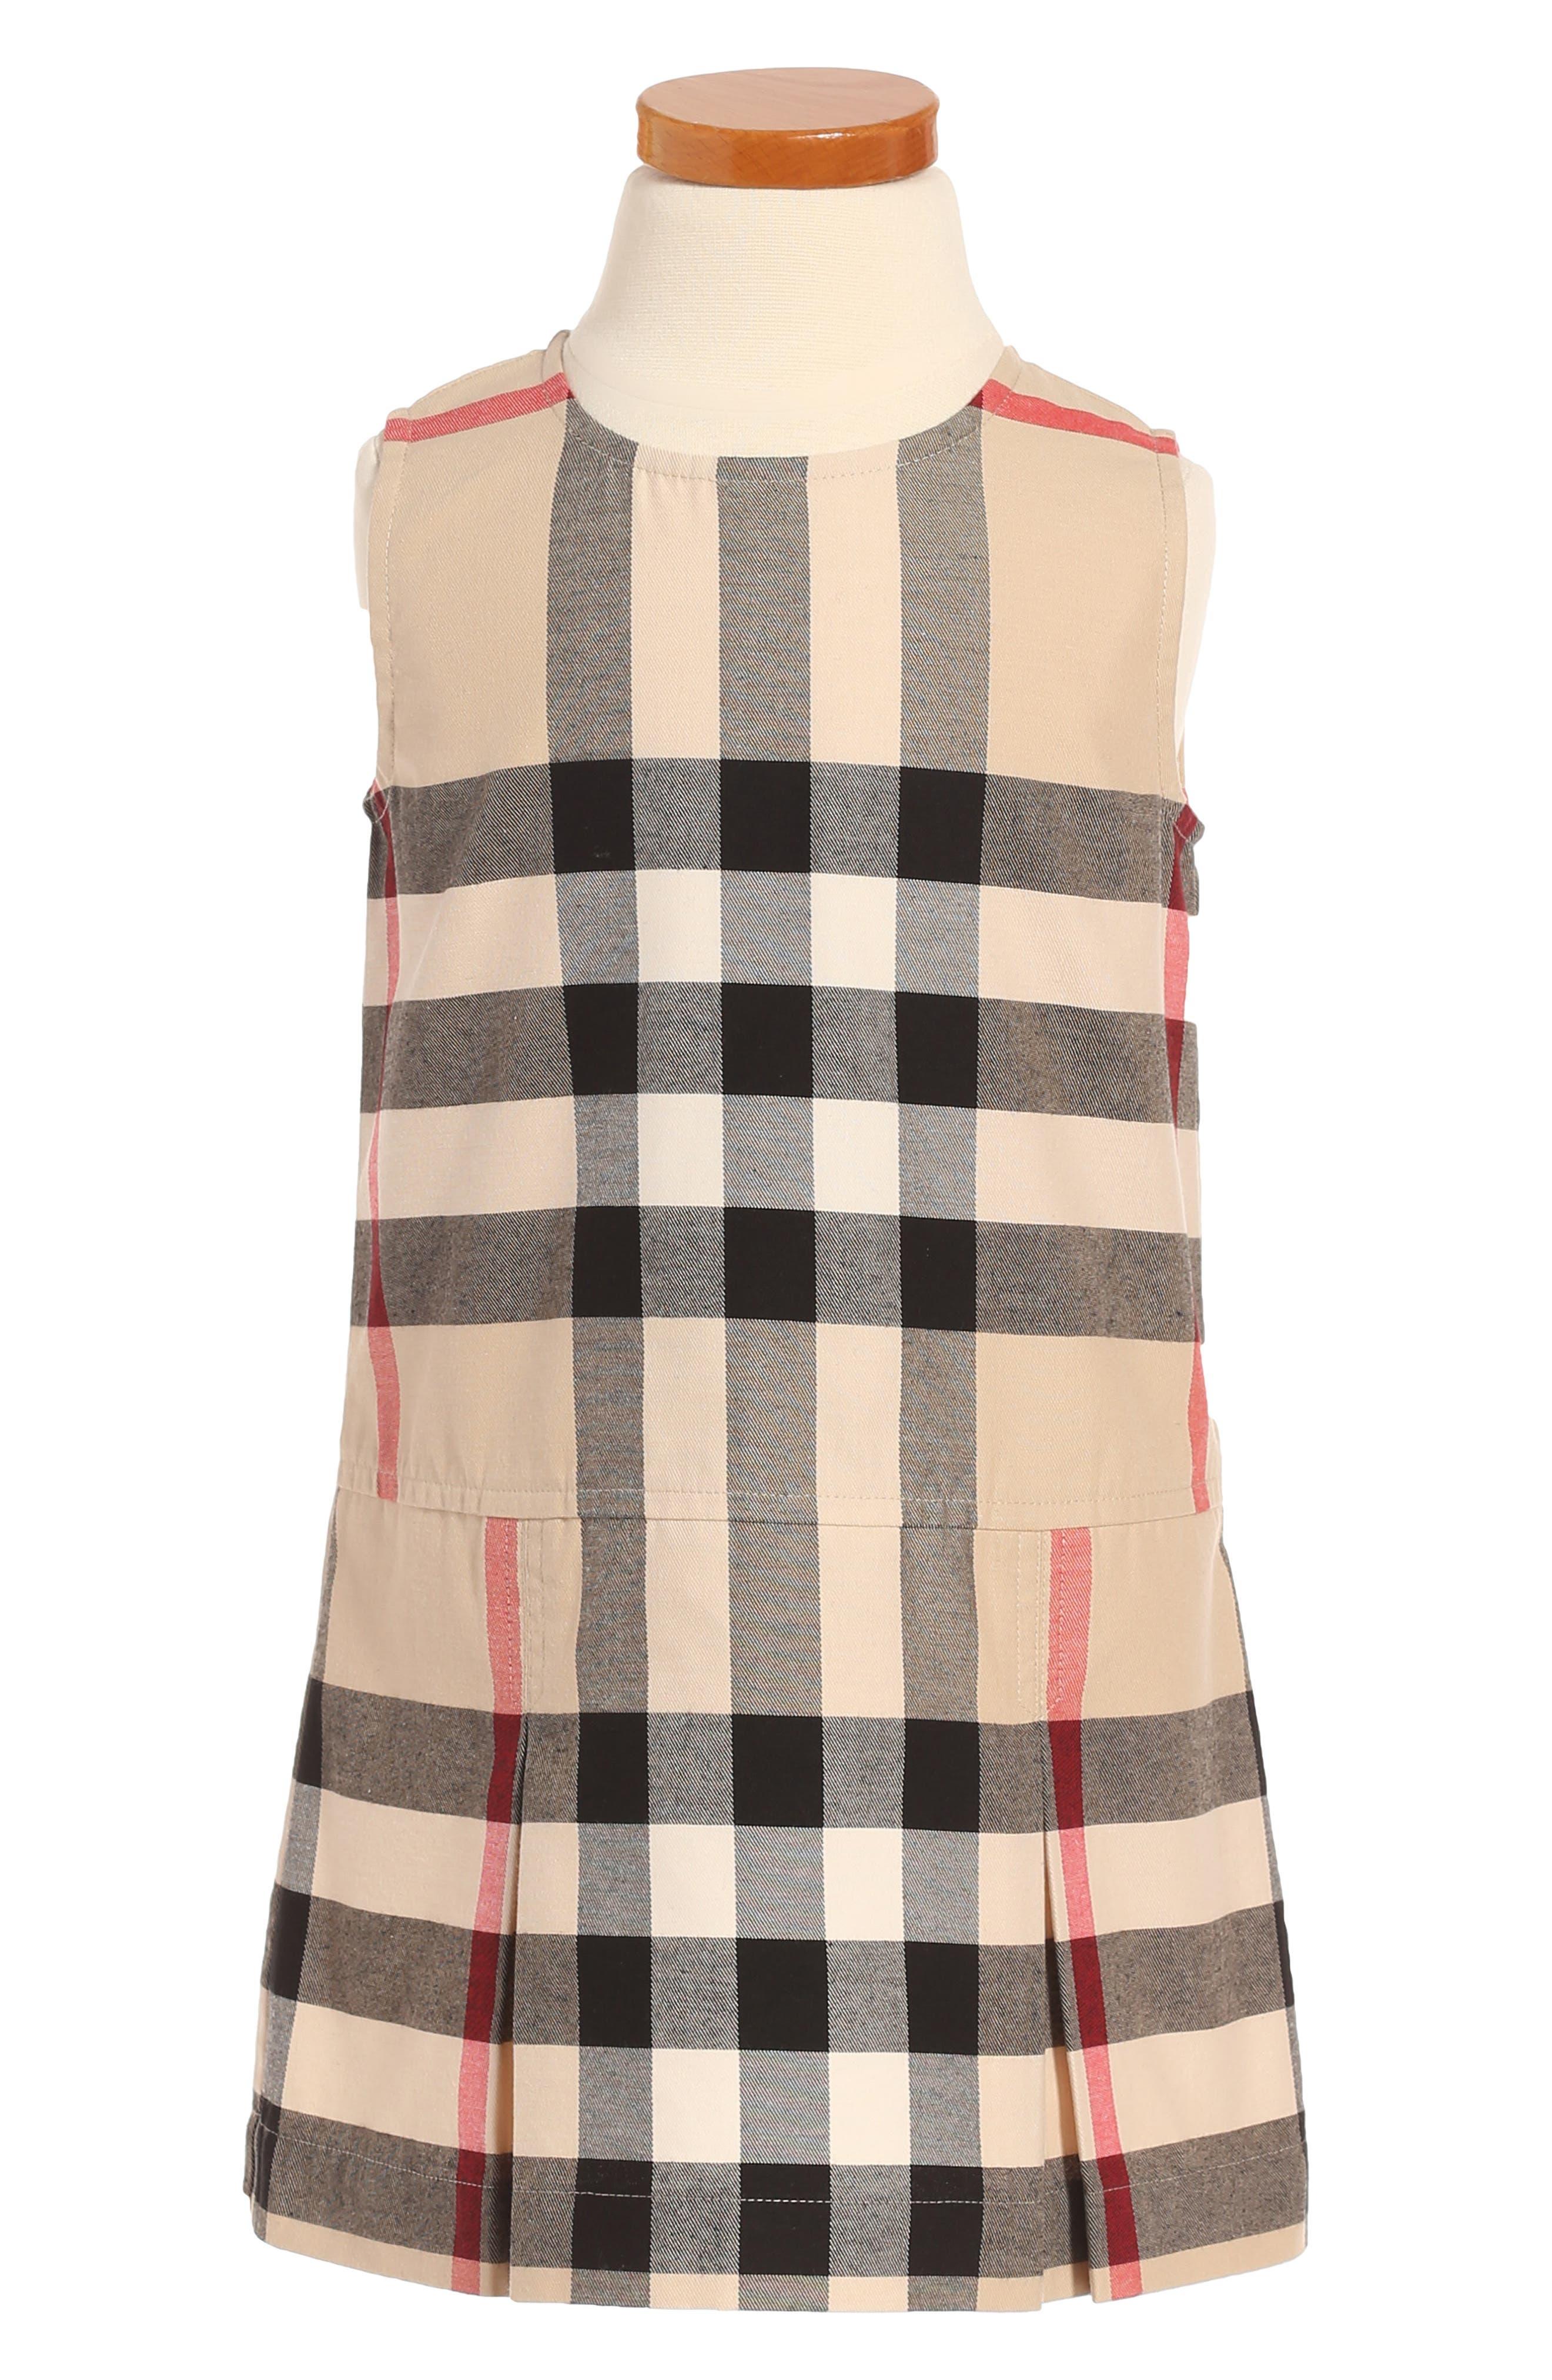 Burberry Dawny Check Print Sleeveless Dress (Toddler Girls)